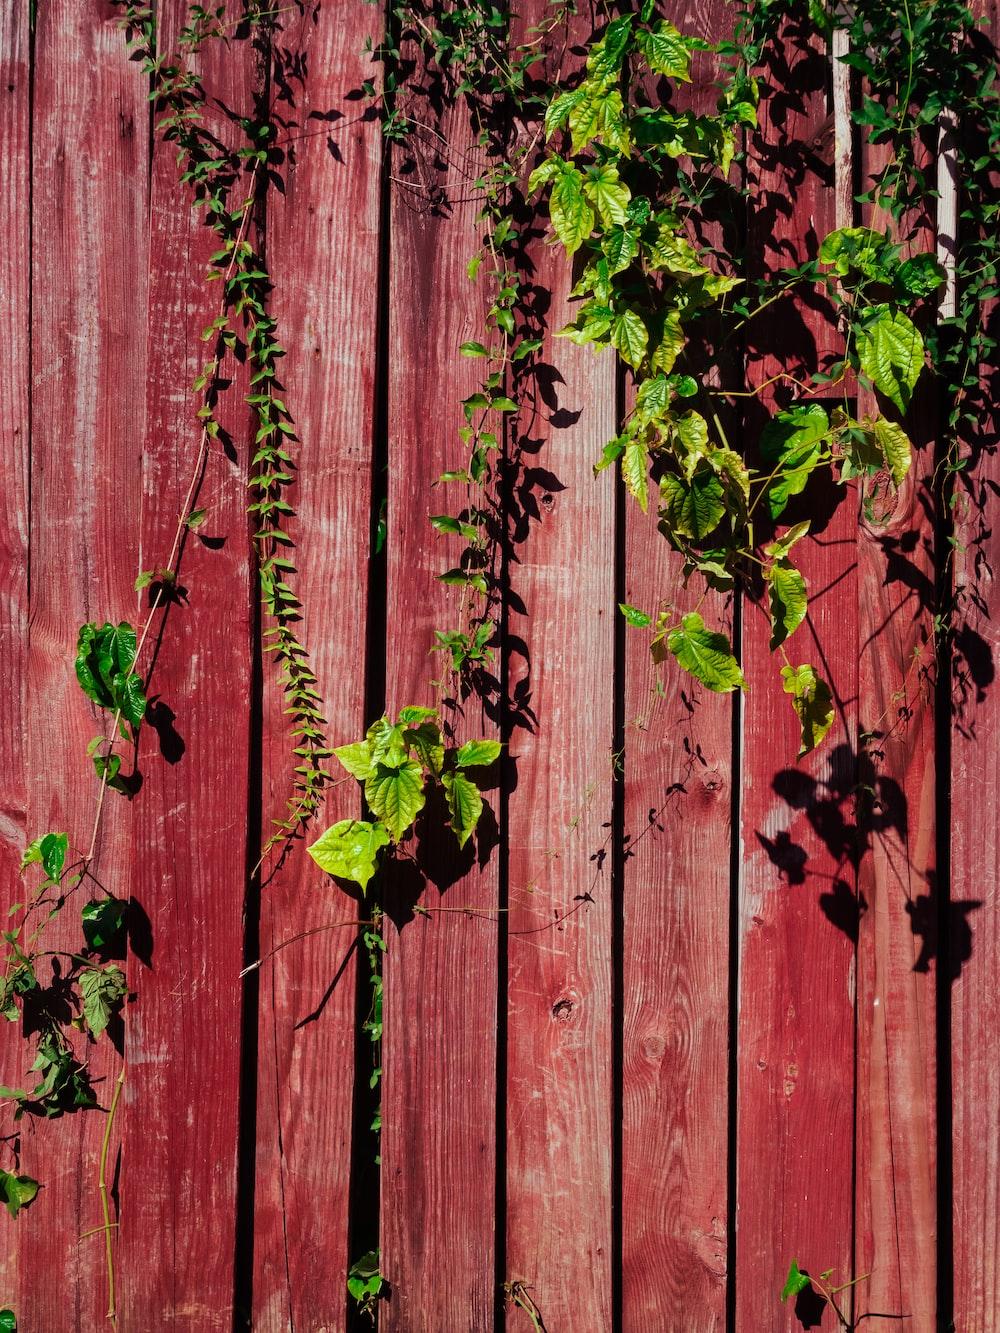 green-leaf plants on fence